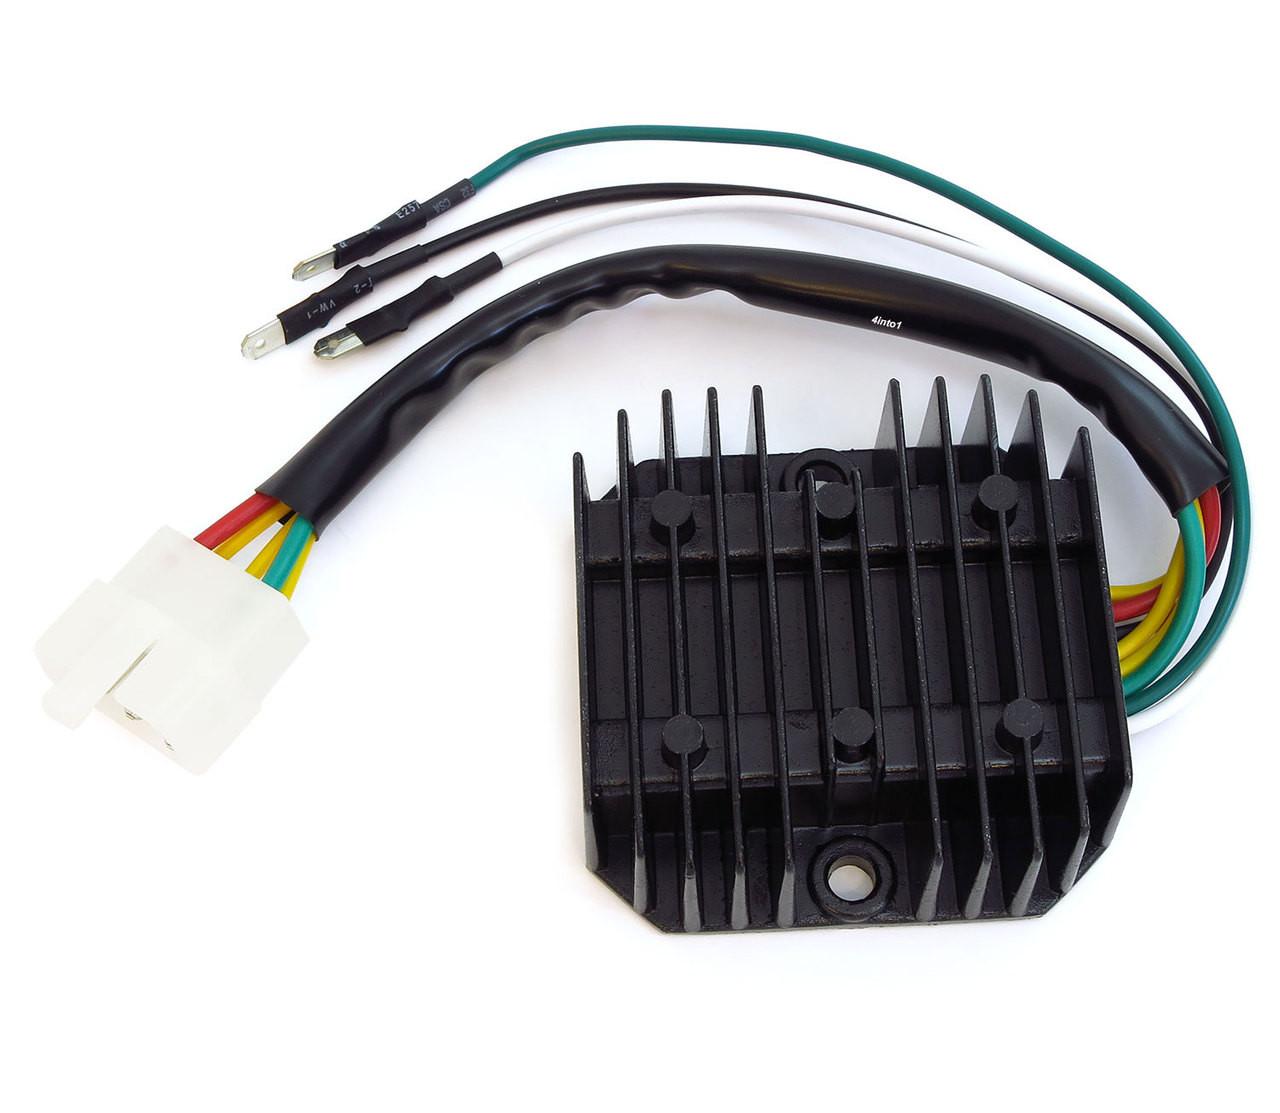 regulator rectifier honda cb350f cb400f cb500 cb550 cb750cb750 regulator rectifier wiring diagram 11 [ 1280 x 1113 Pixel ]